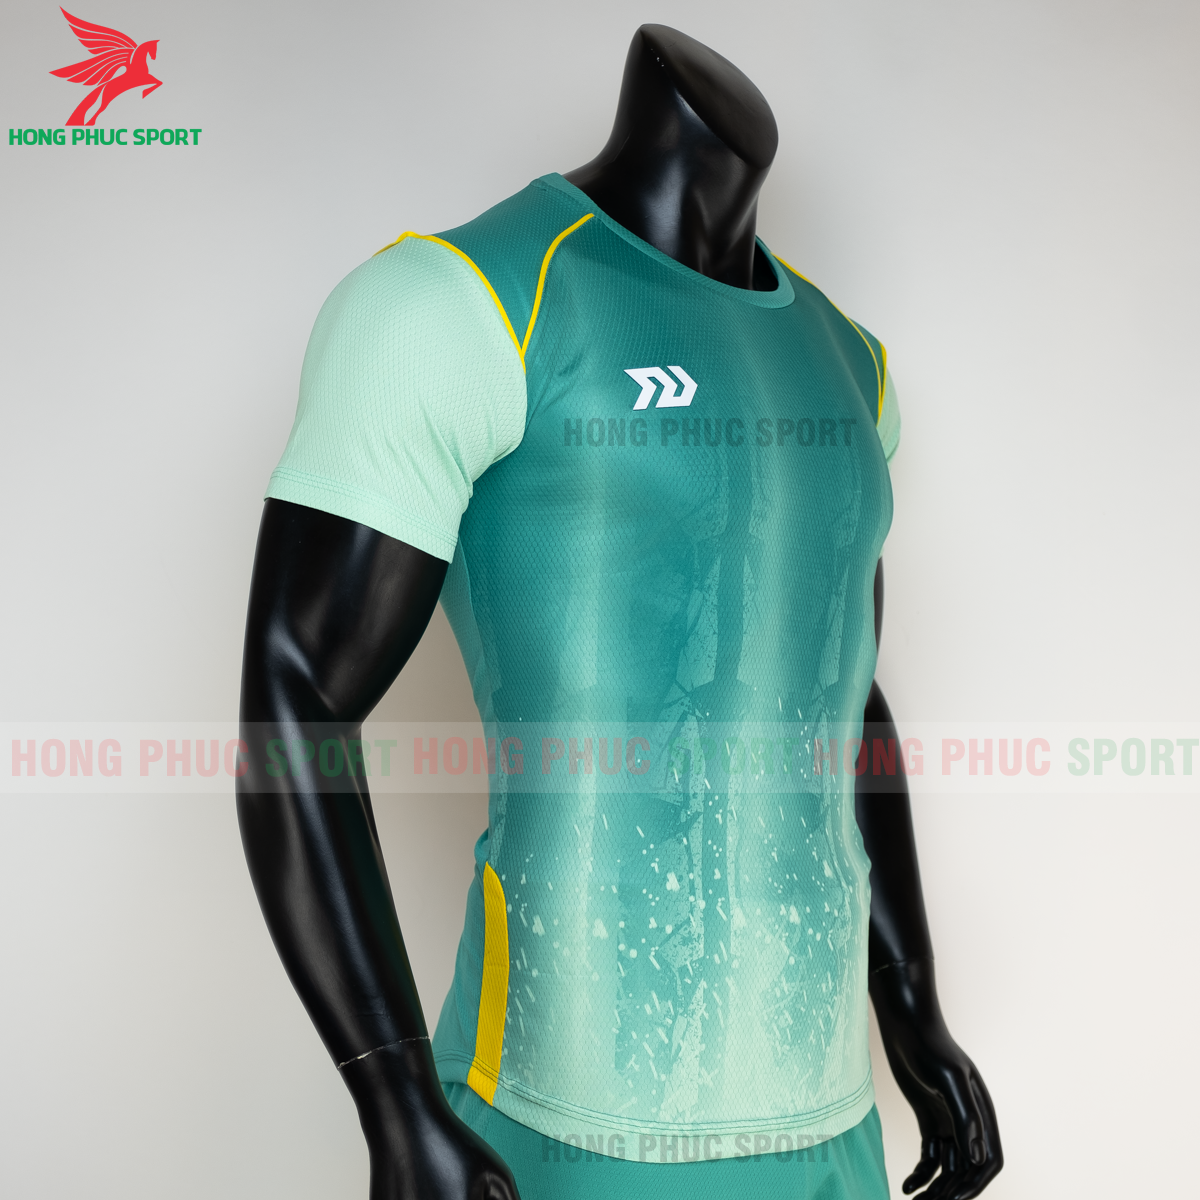 https://cdn.hongphucsport.com/unsafe/s4.shopbay.vn/files/285/ao-bong-da-khong-logo-bulbal-hades-mau-xanh-la-5-604f3434a3709.png